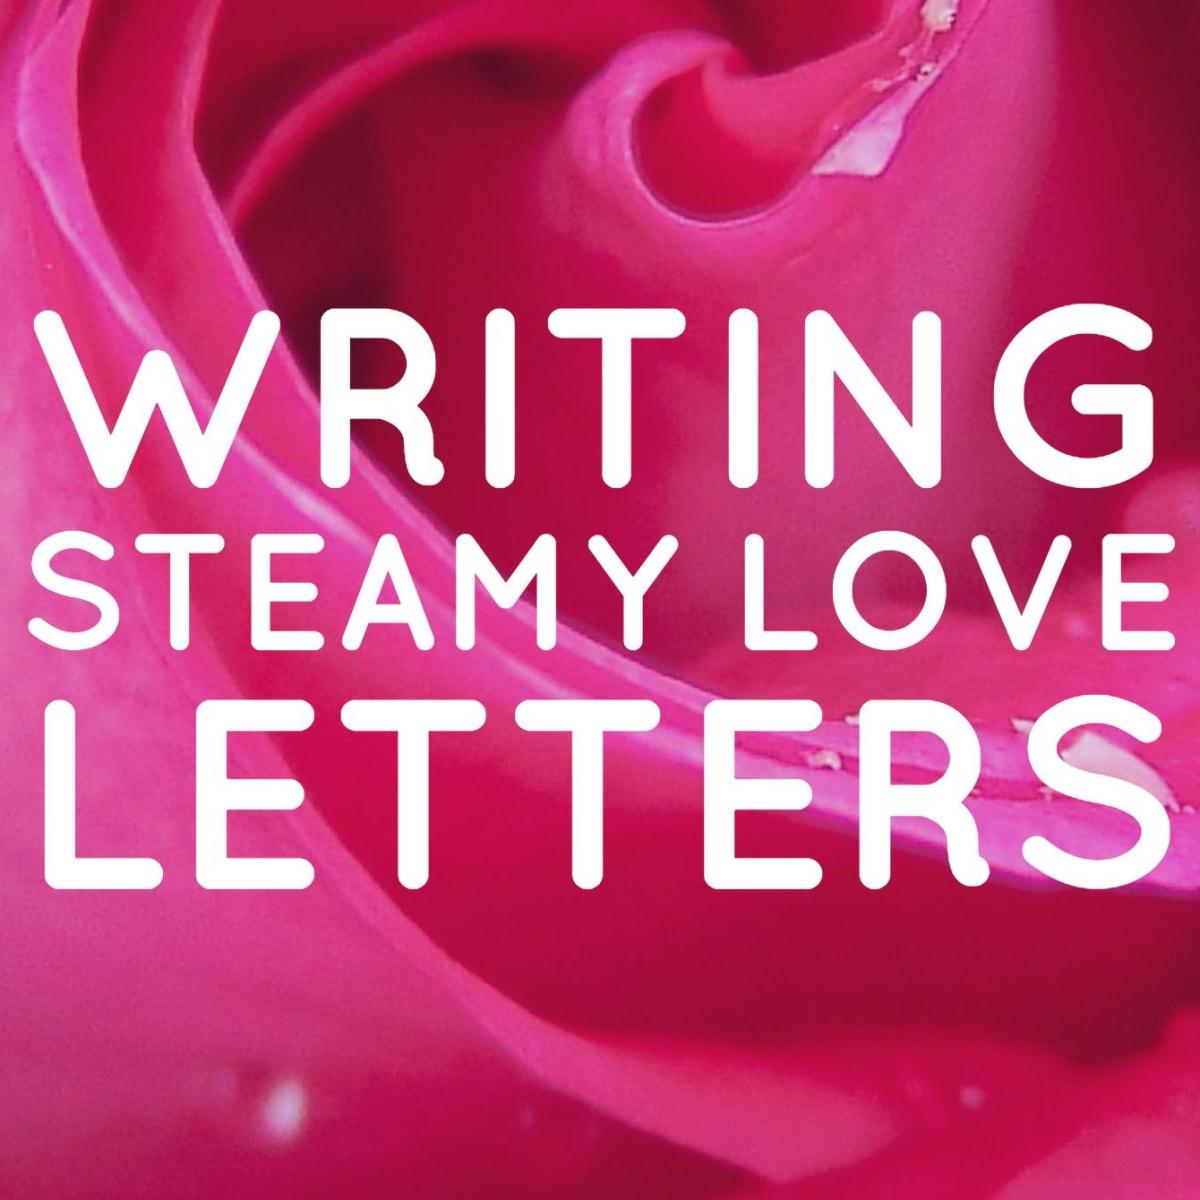 Sample seductive love letters for him